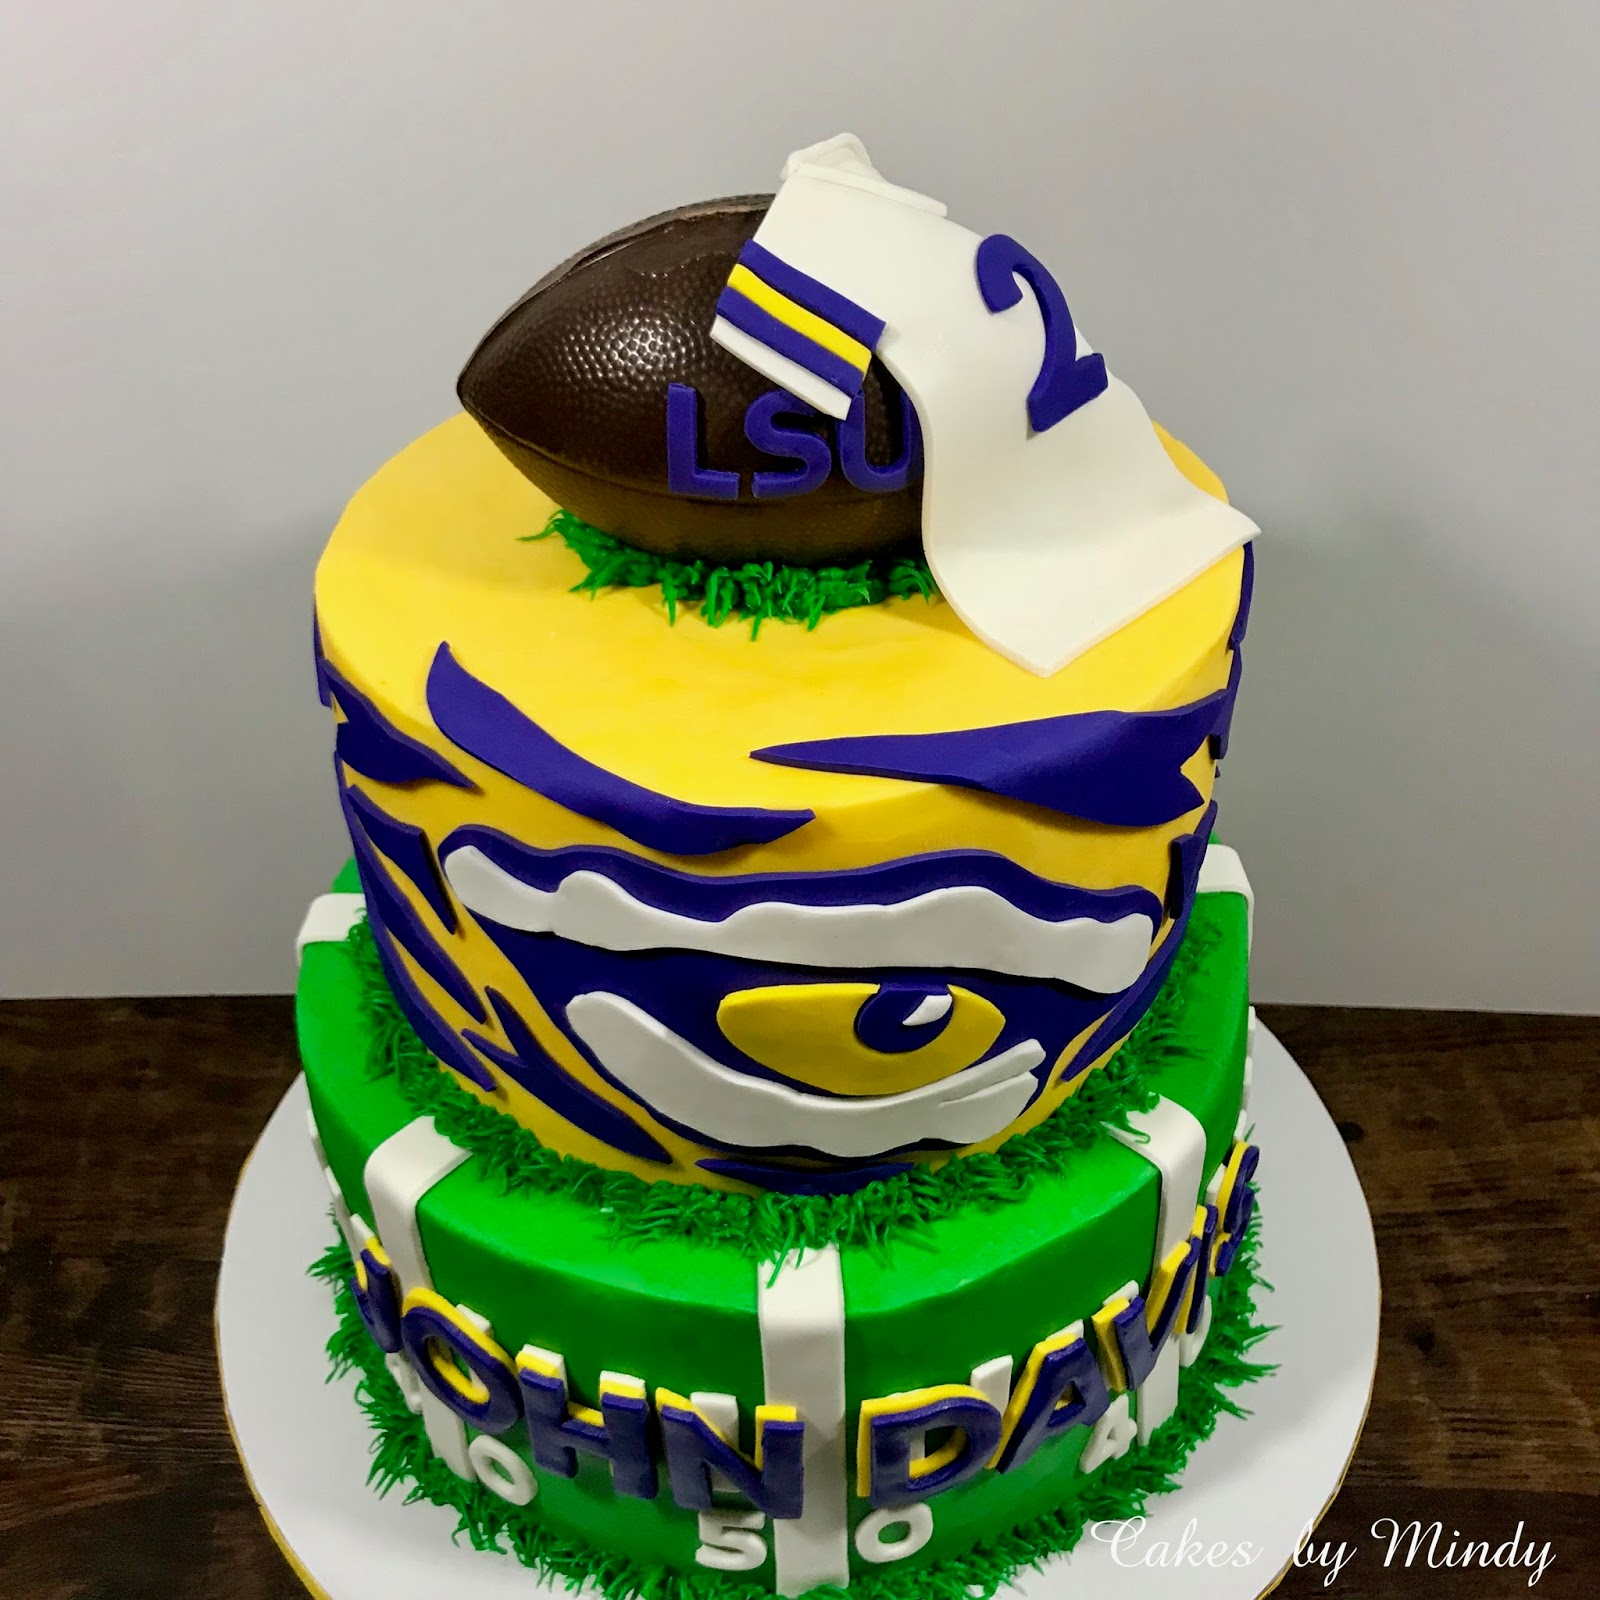 Fine Cakes By Mindy Lsu Tigers Birthday Cake 8 10 Personalised Birthday Cards Veneteletsinfo